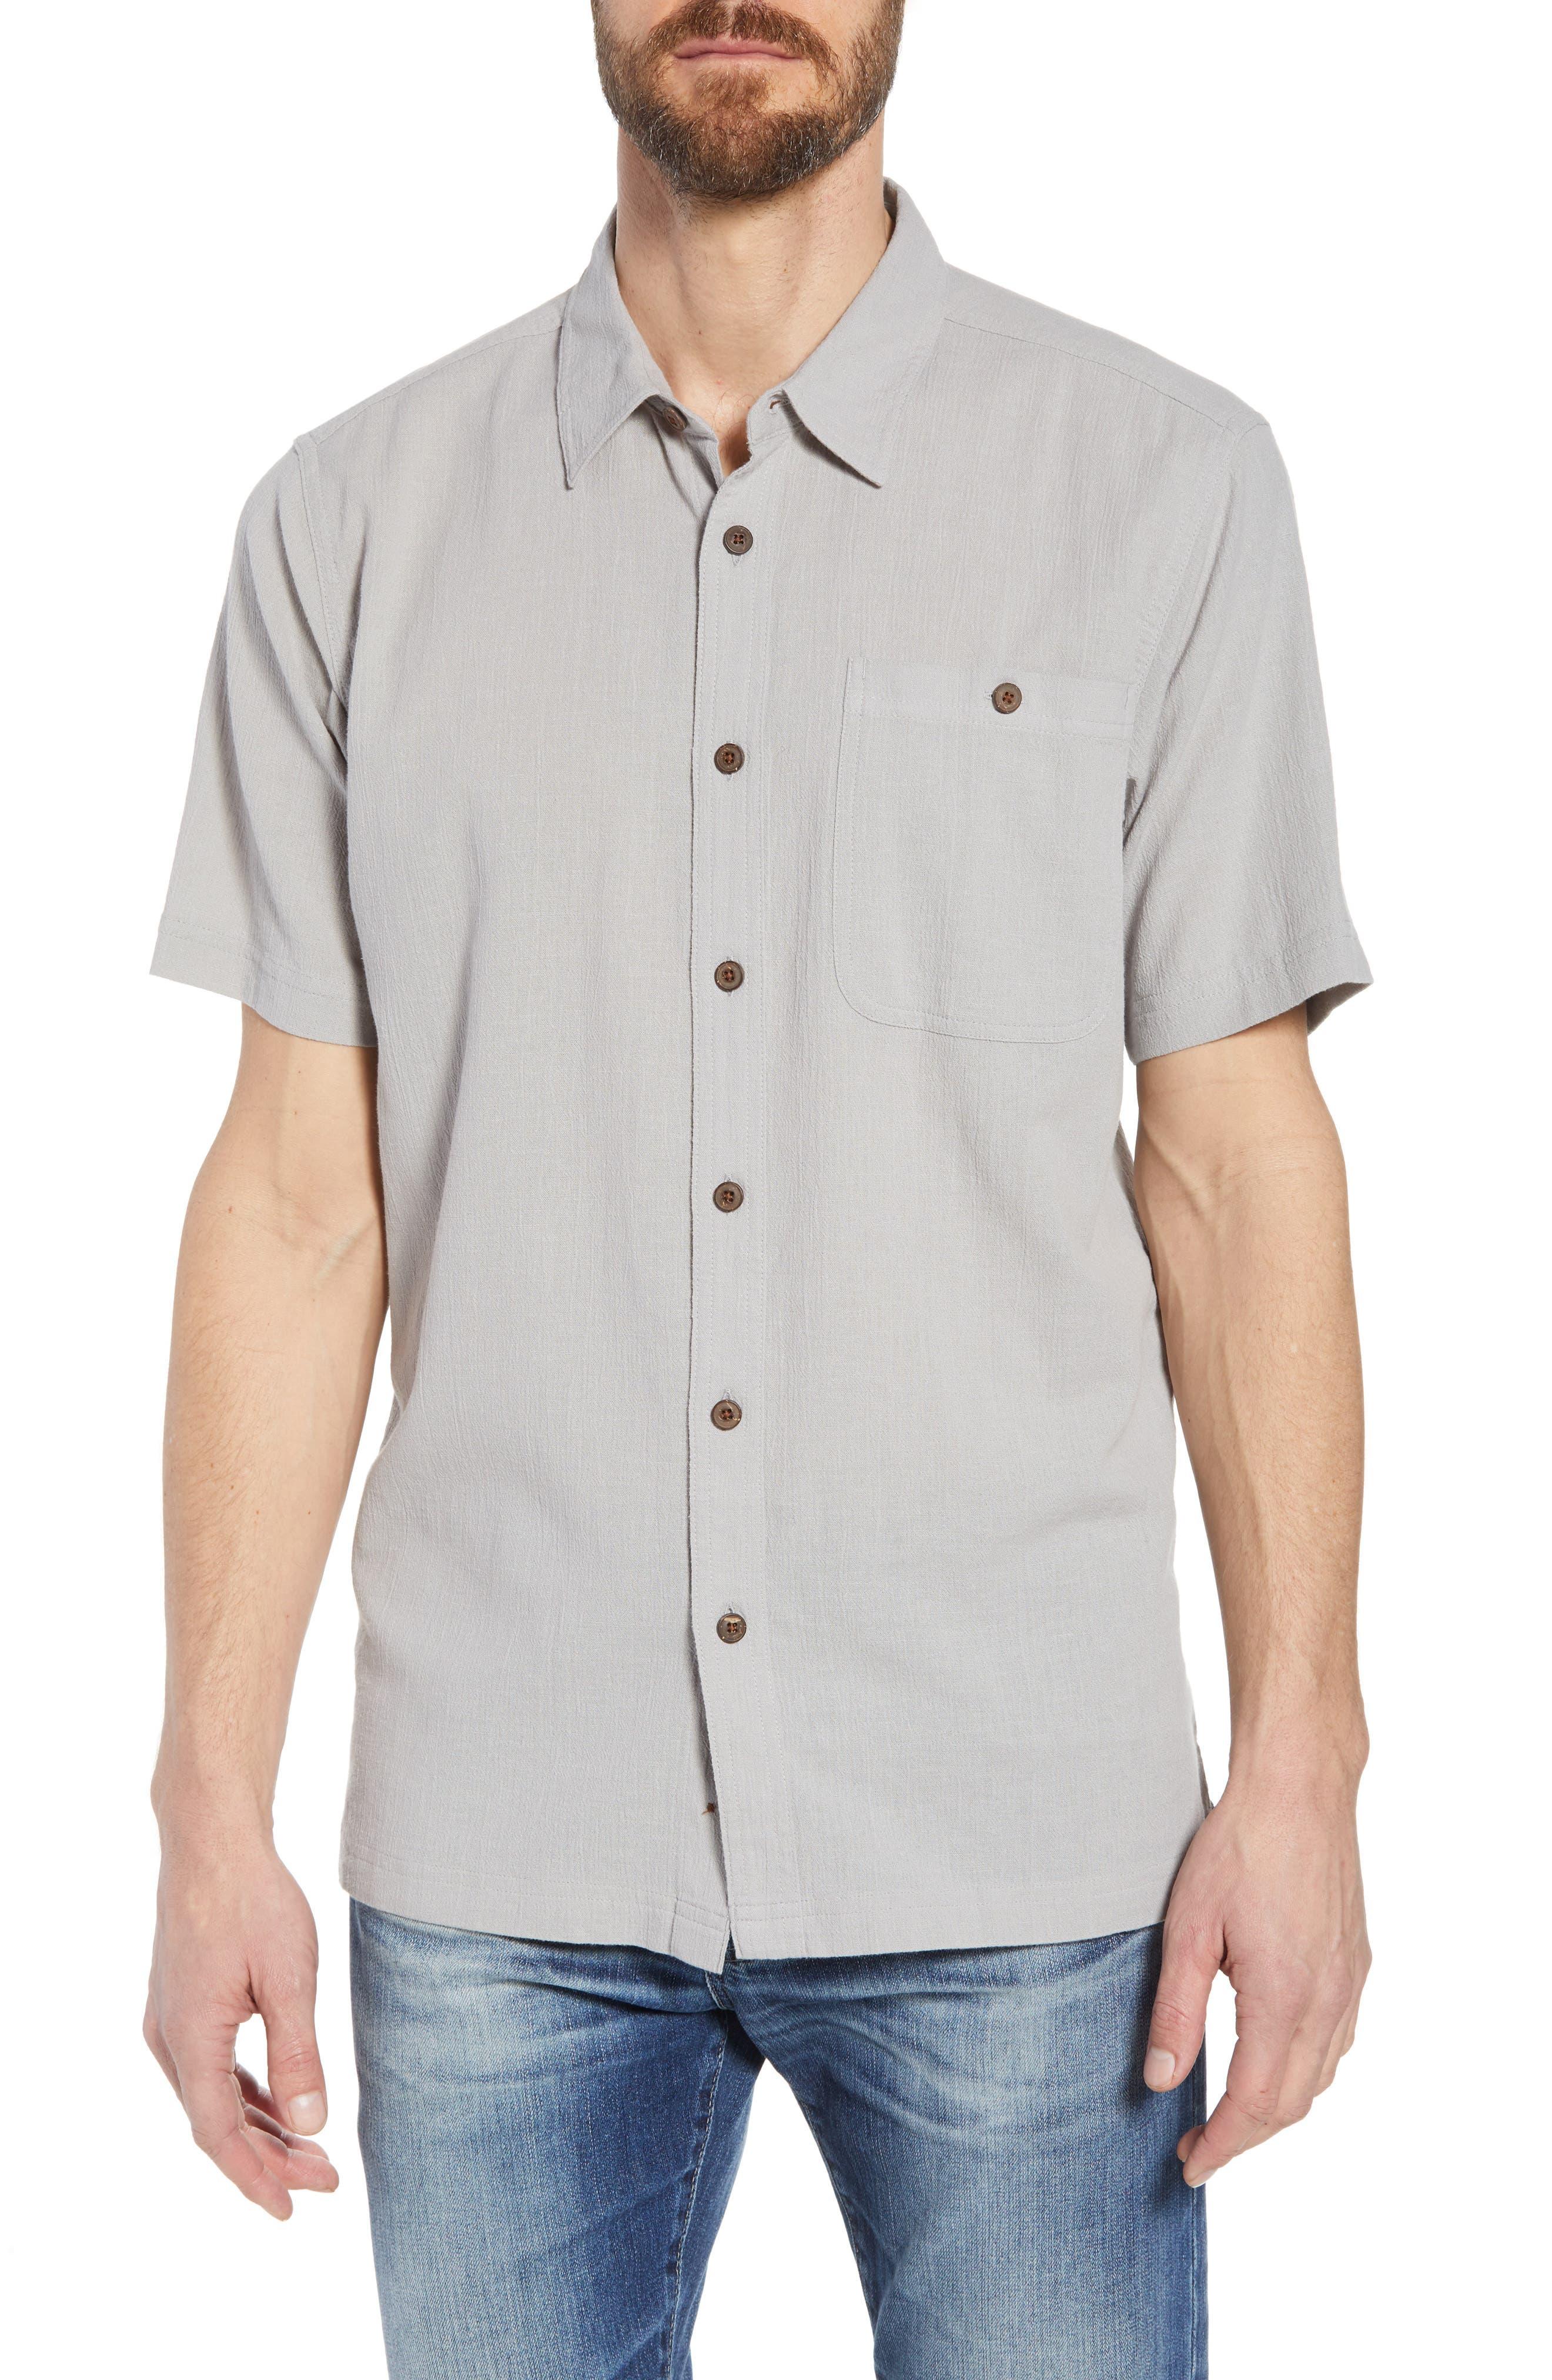 'A/C<sup>®</sup>' Regular Fit Organic Cotton Short Sleeve Sport Shirt,                             Main thumbnail 1, color,                             022